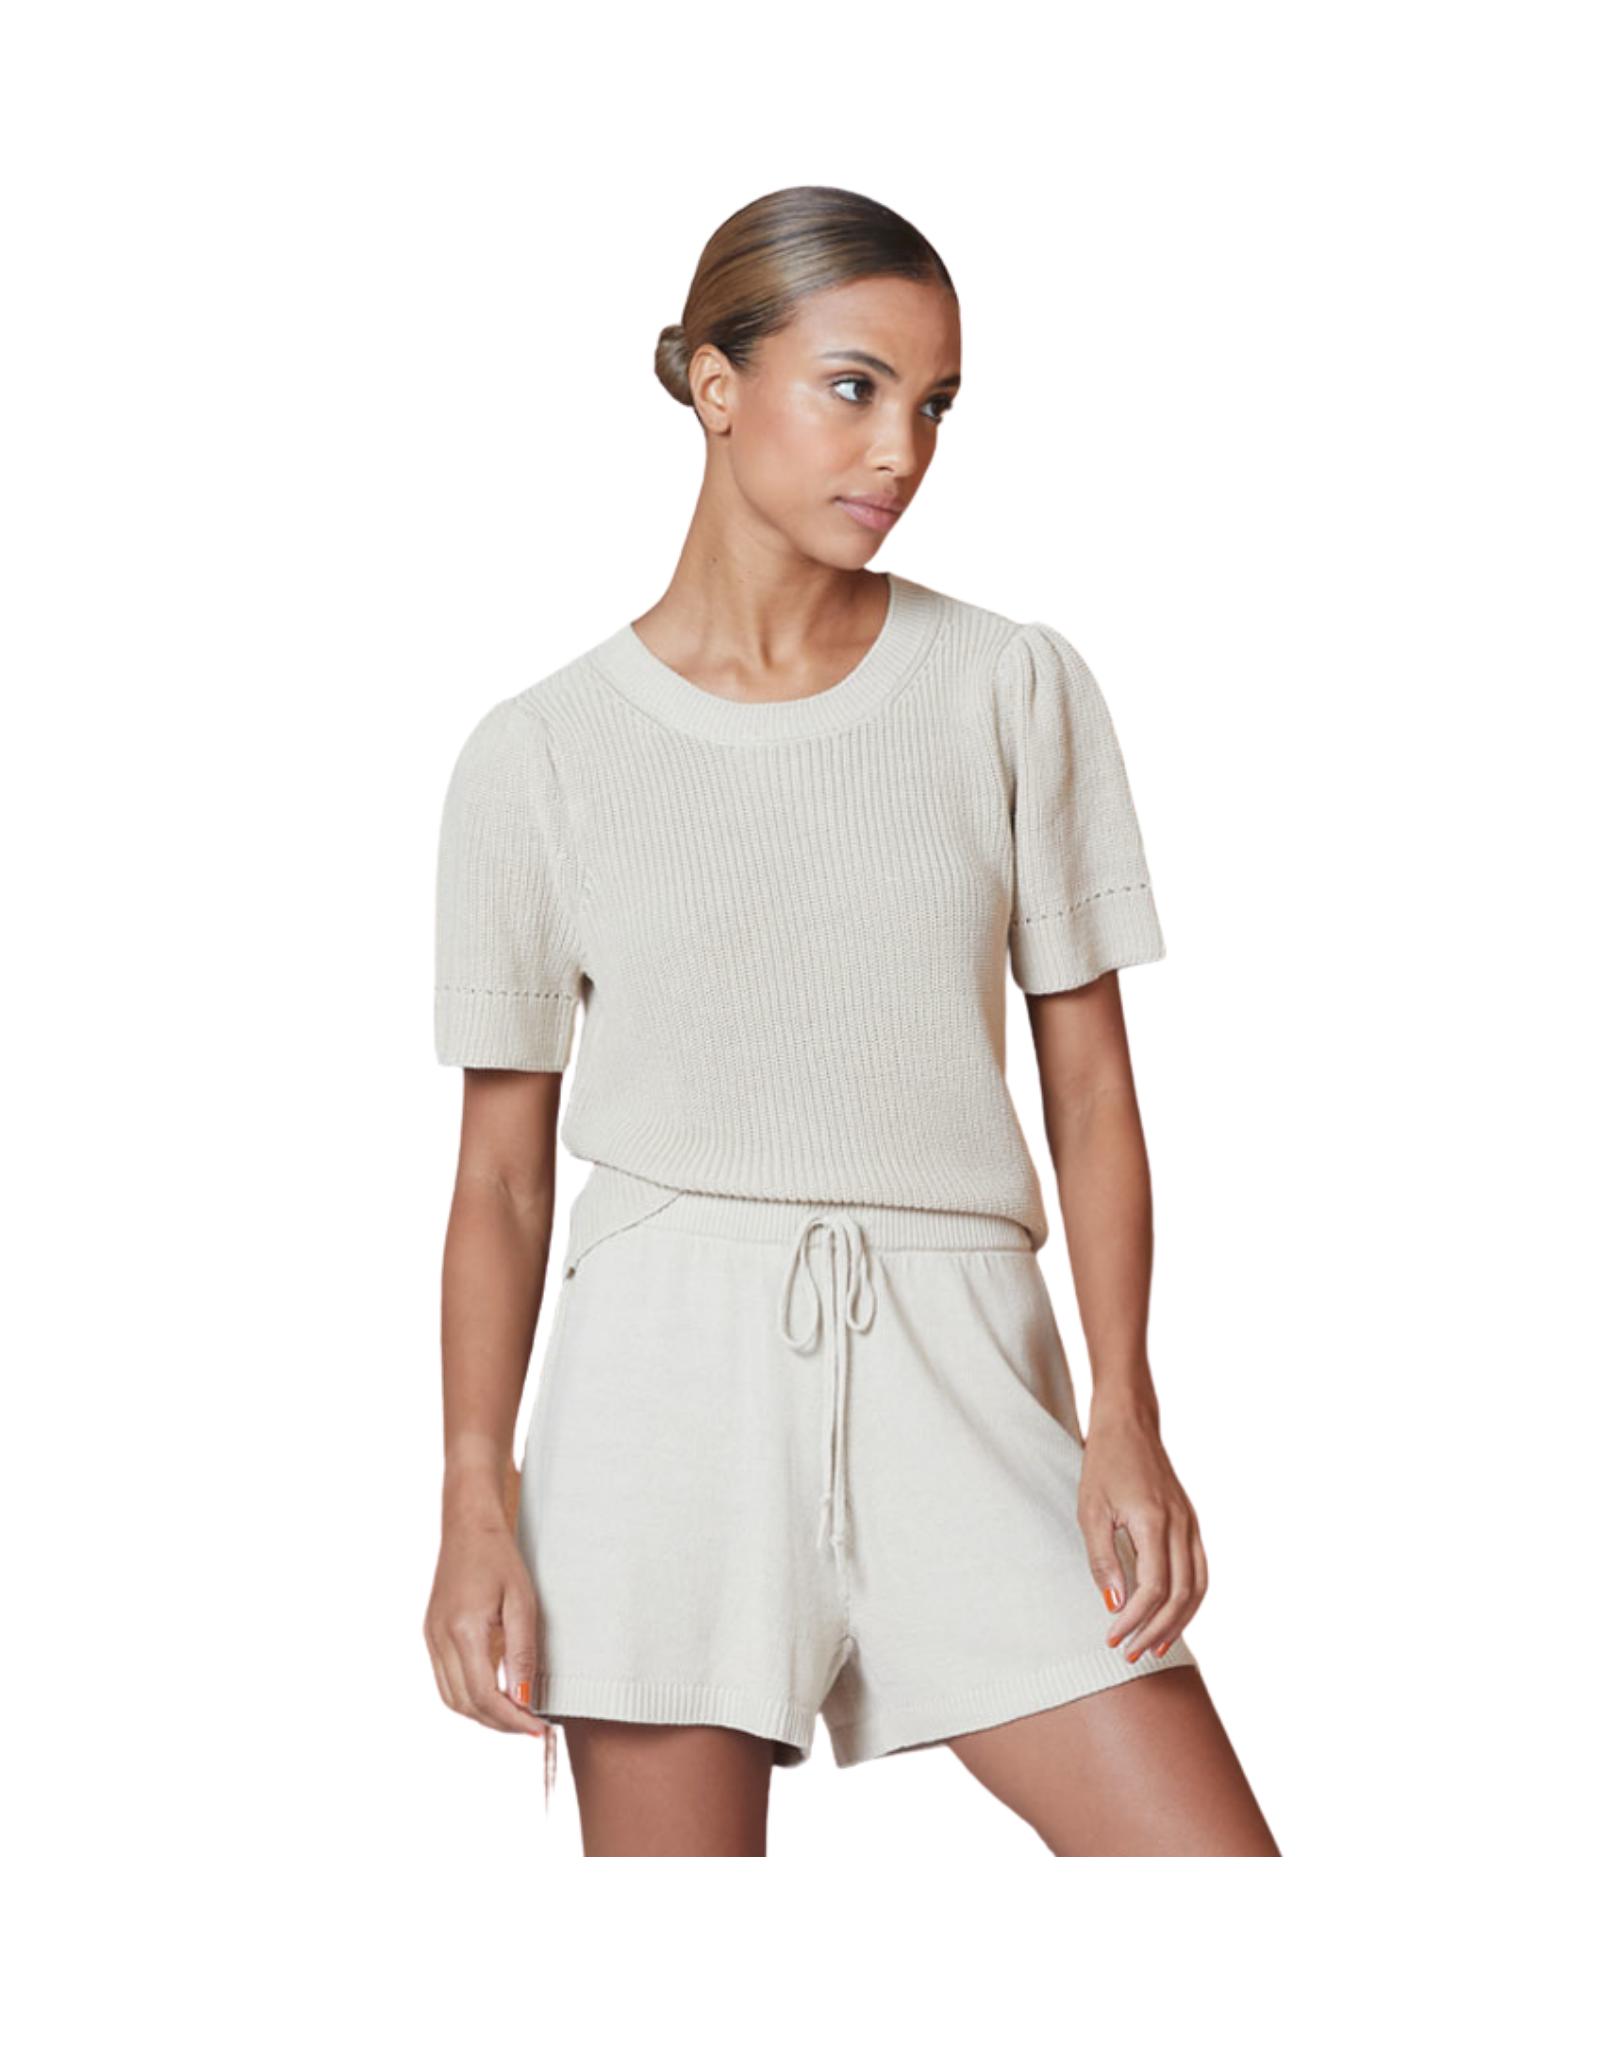 DH New York Sophia Shorts Seashell